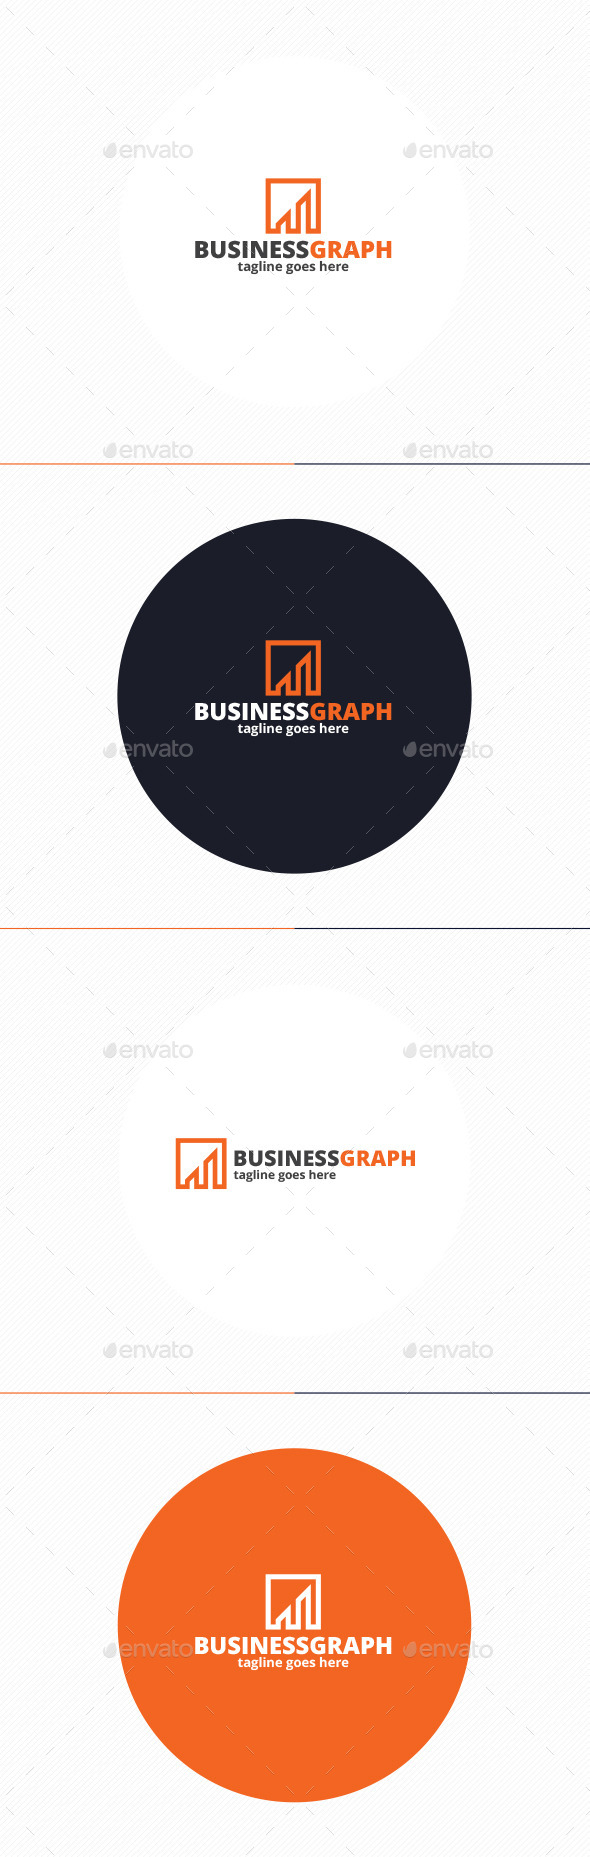 Business Graph Logo - Vector Abstract